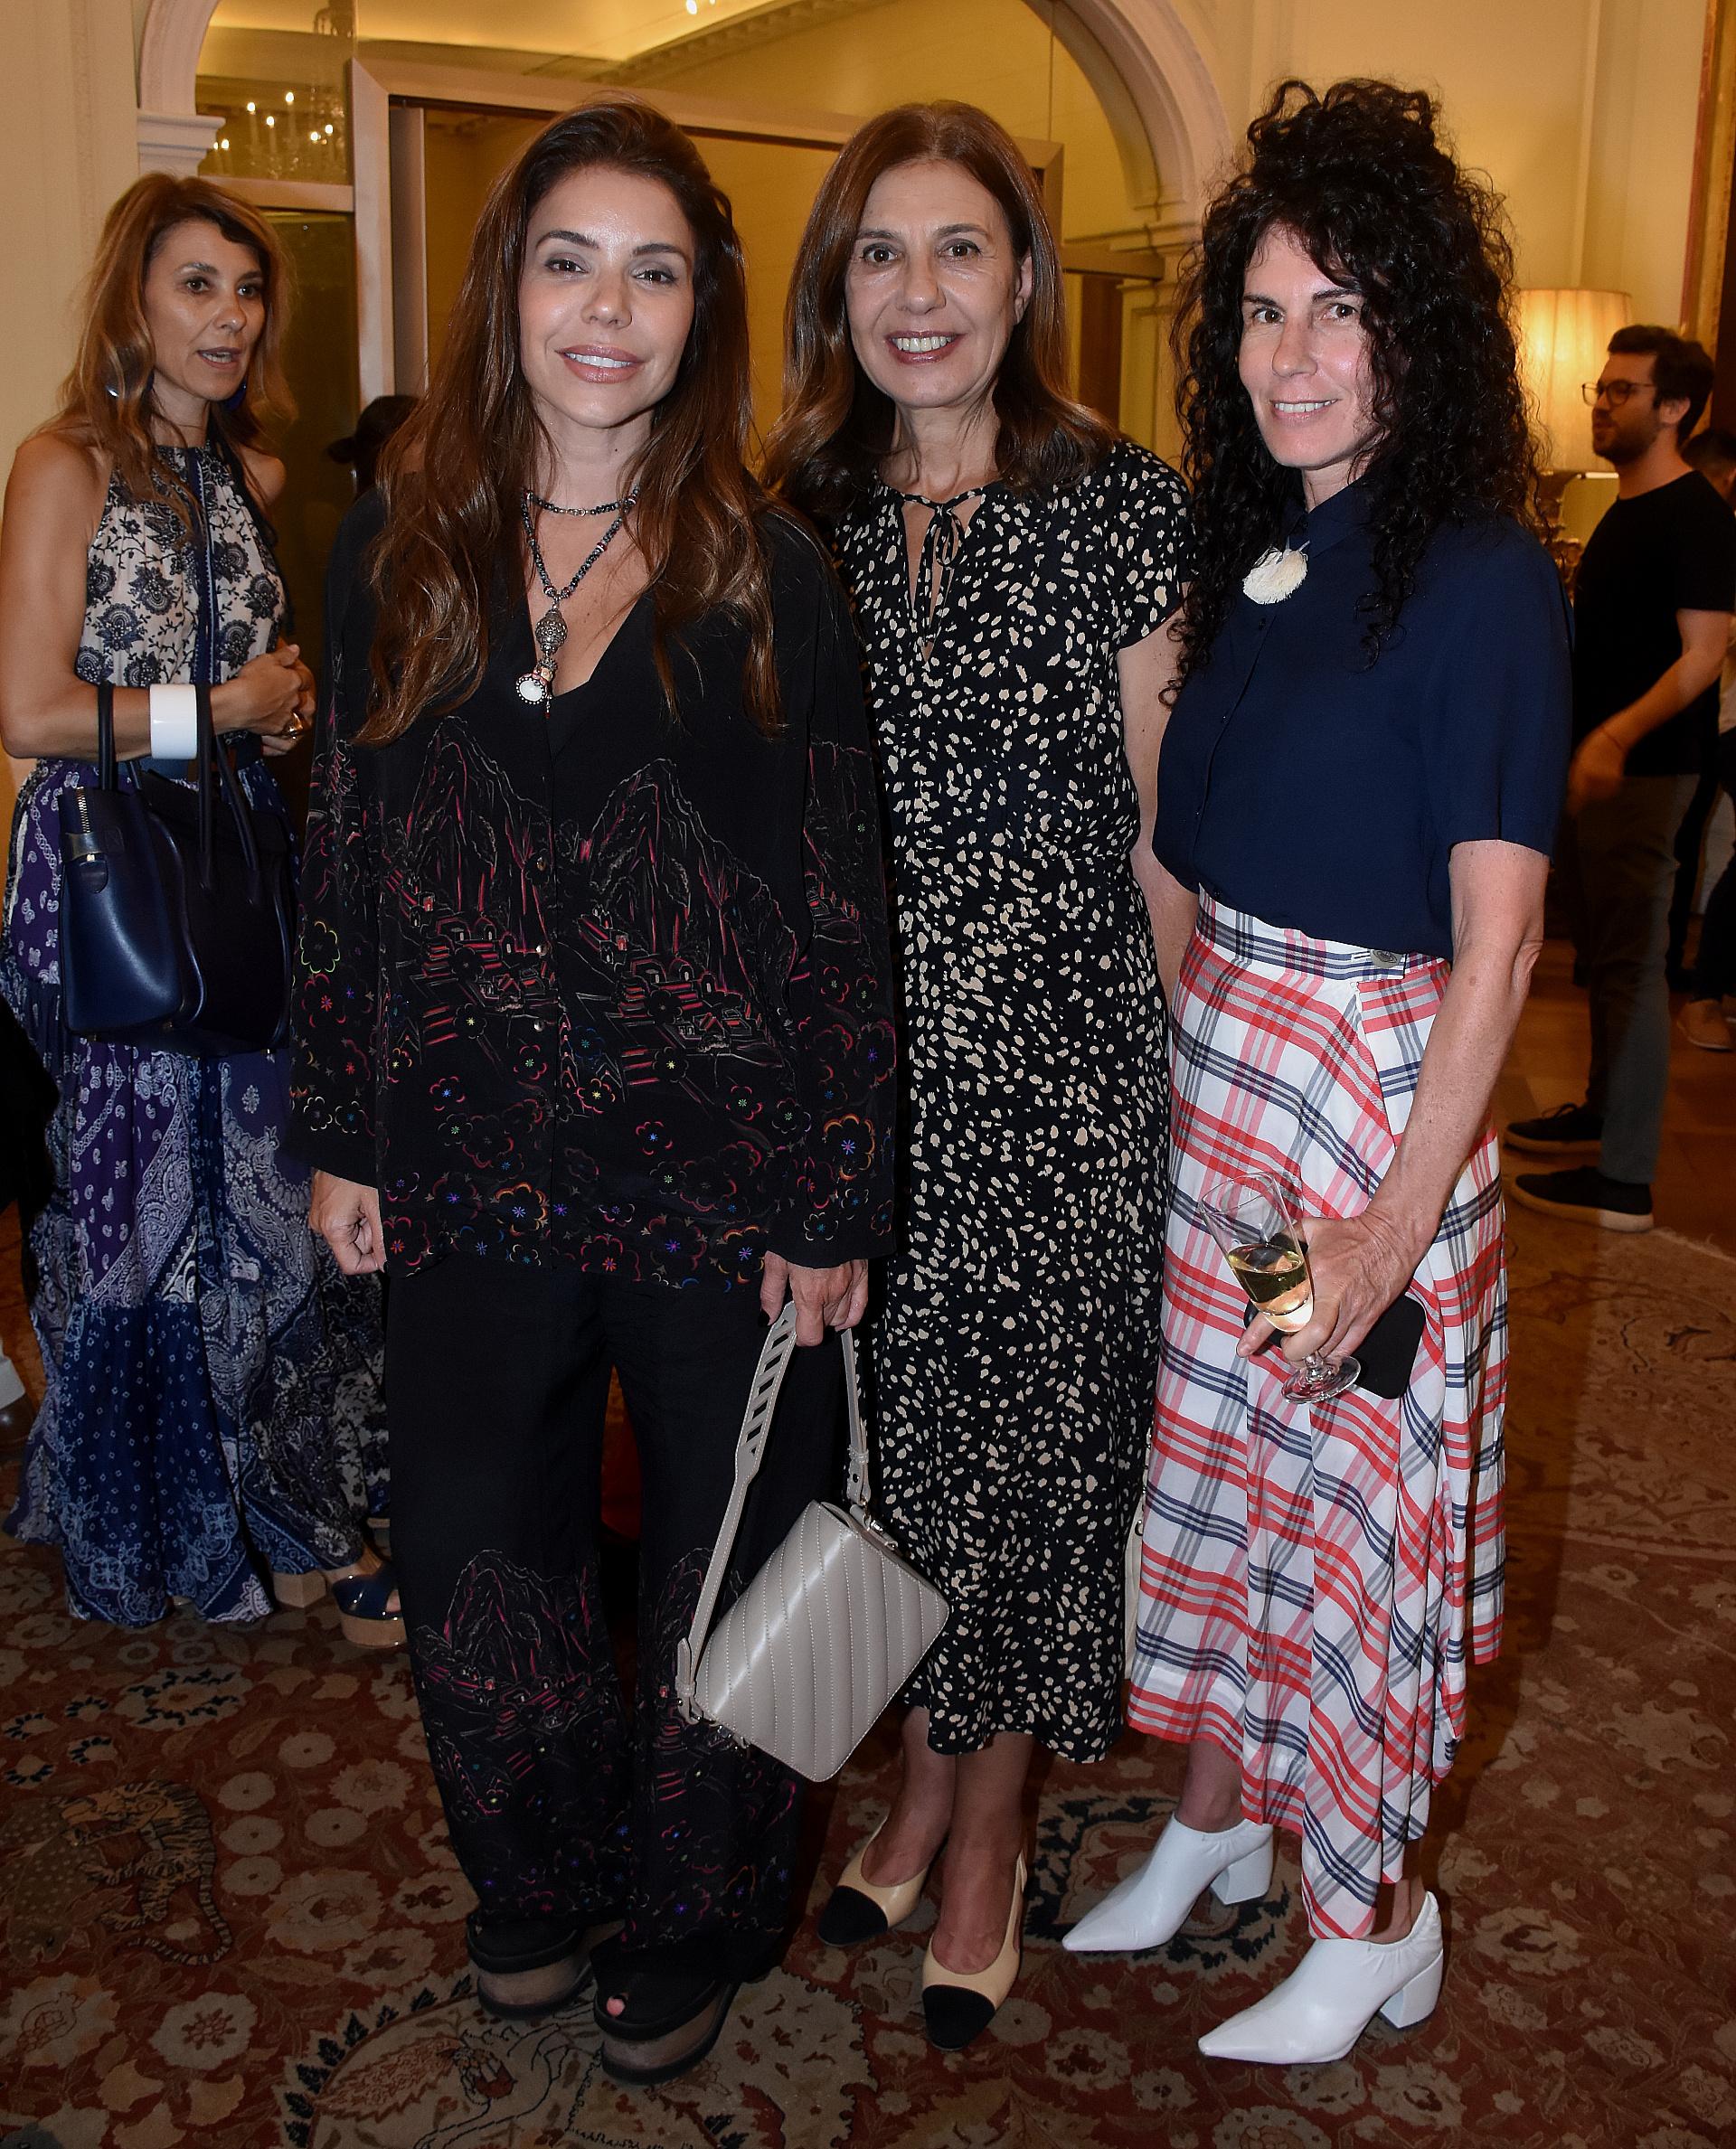 Romina Pigretti, Zoraida Awada y Cynthia Cohen